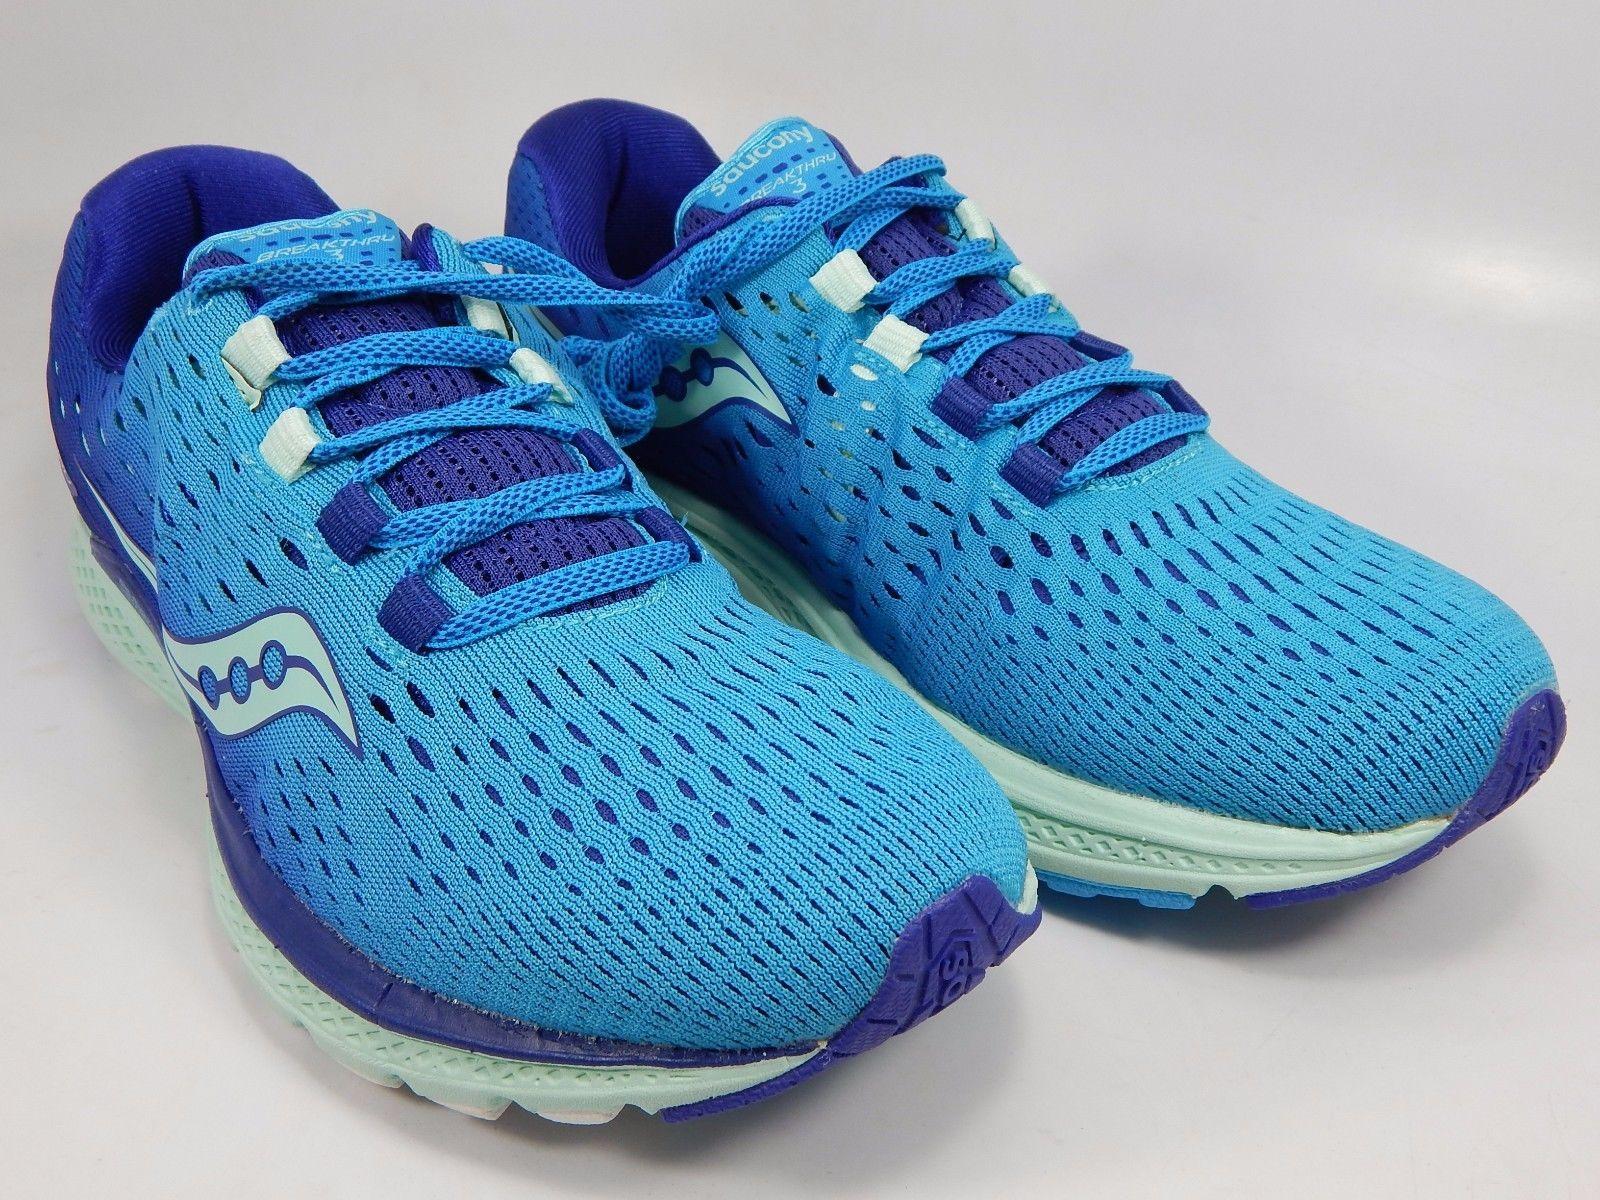 Saucony Breakthru 3 Women's Running Shoes Size US 8 M (B) EU 39 Blue S10358-1